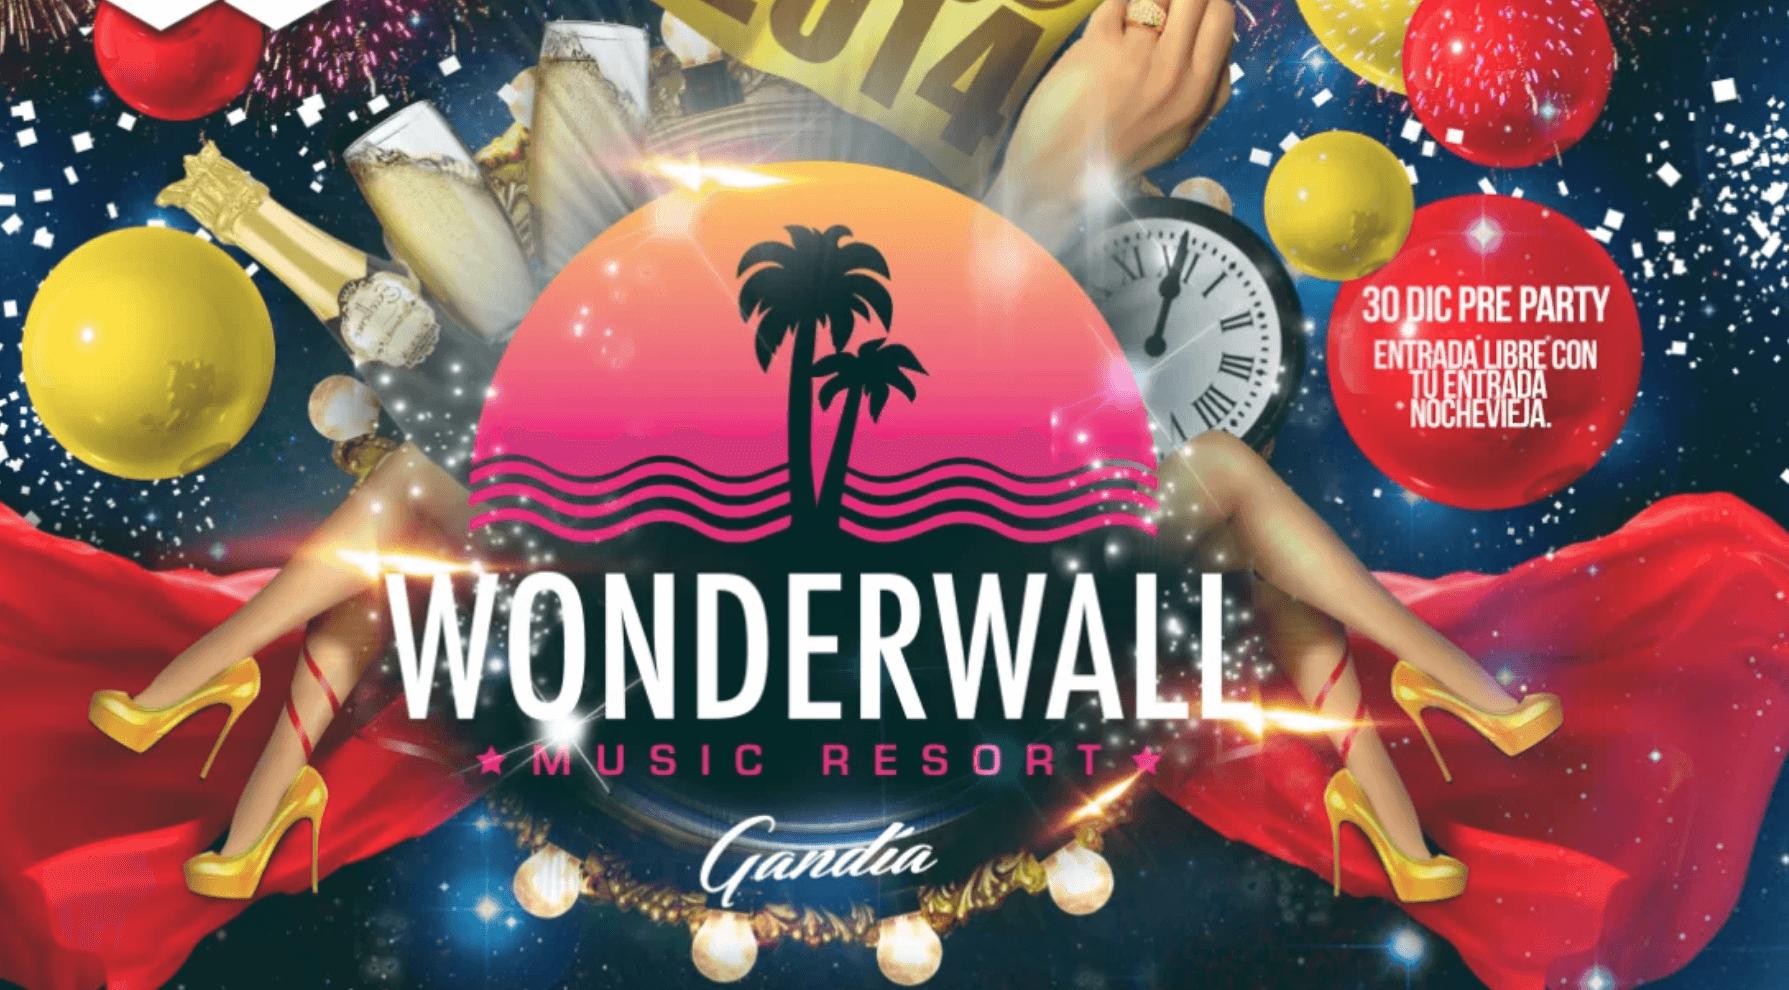 Nochevieja 2014 – Wonderwall Gandia – By Rec Studios